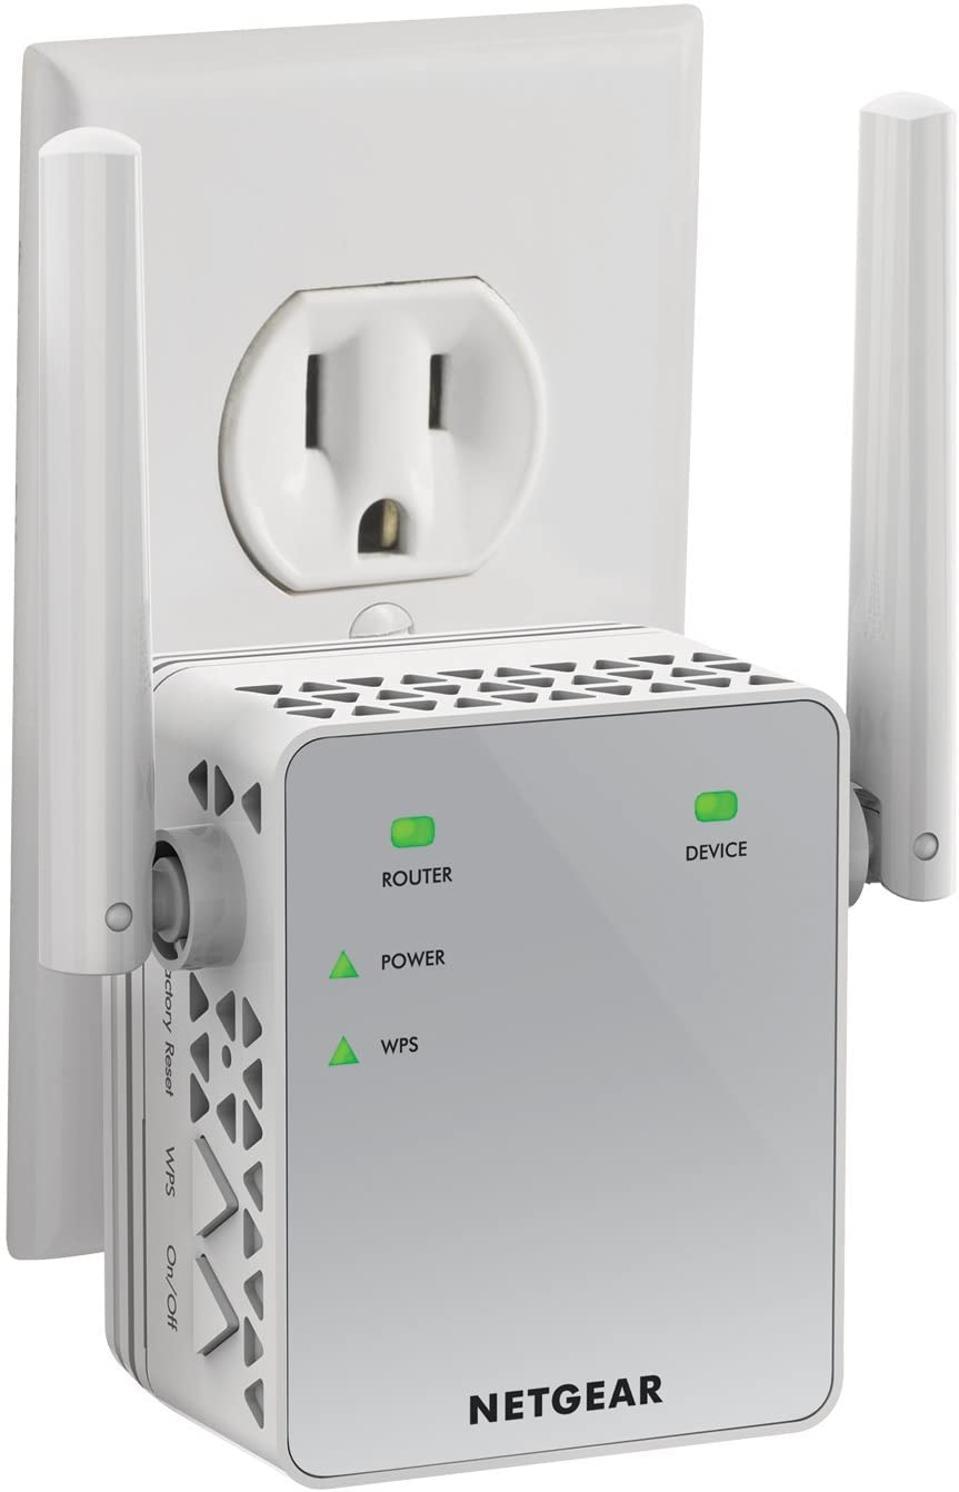 Netgear wifi range extender plugged into an outlet